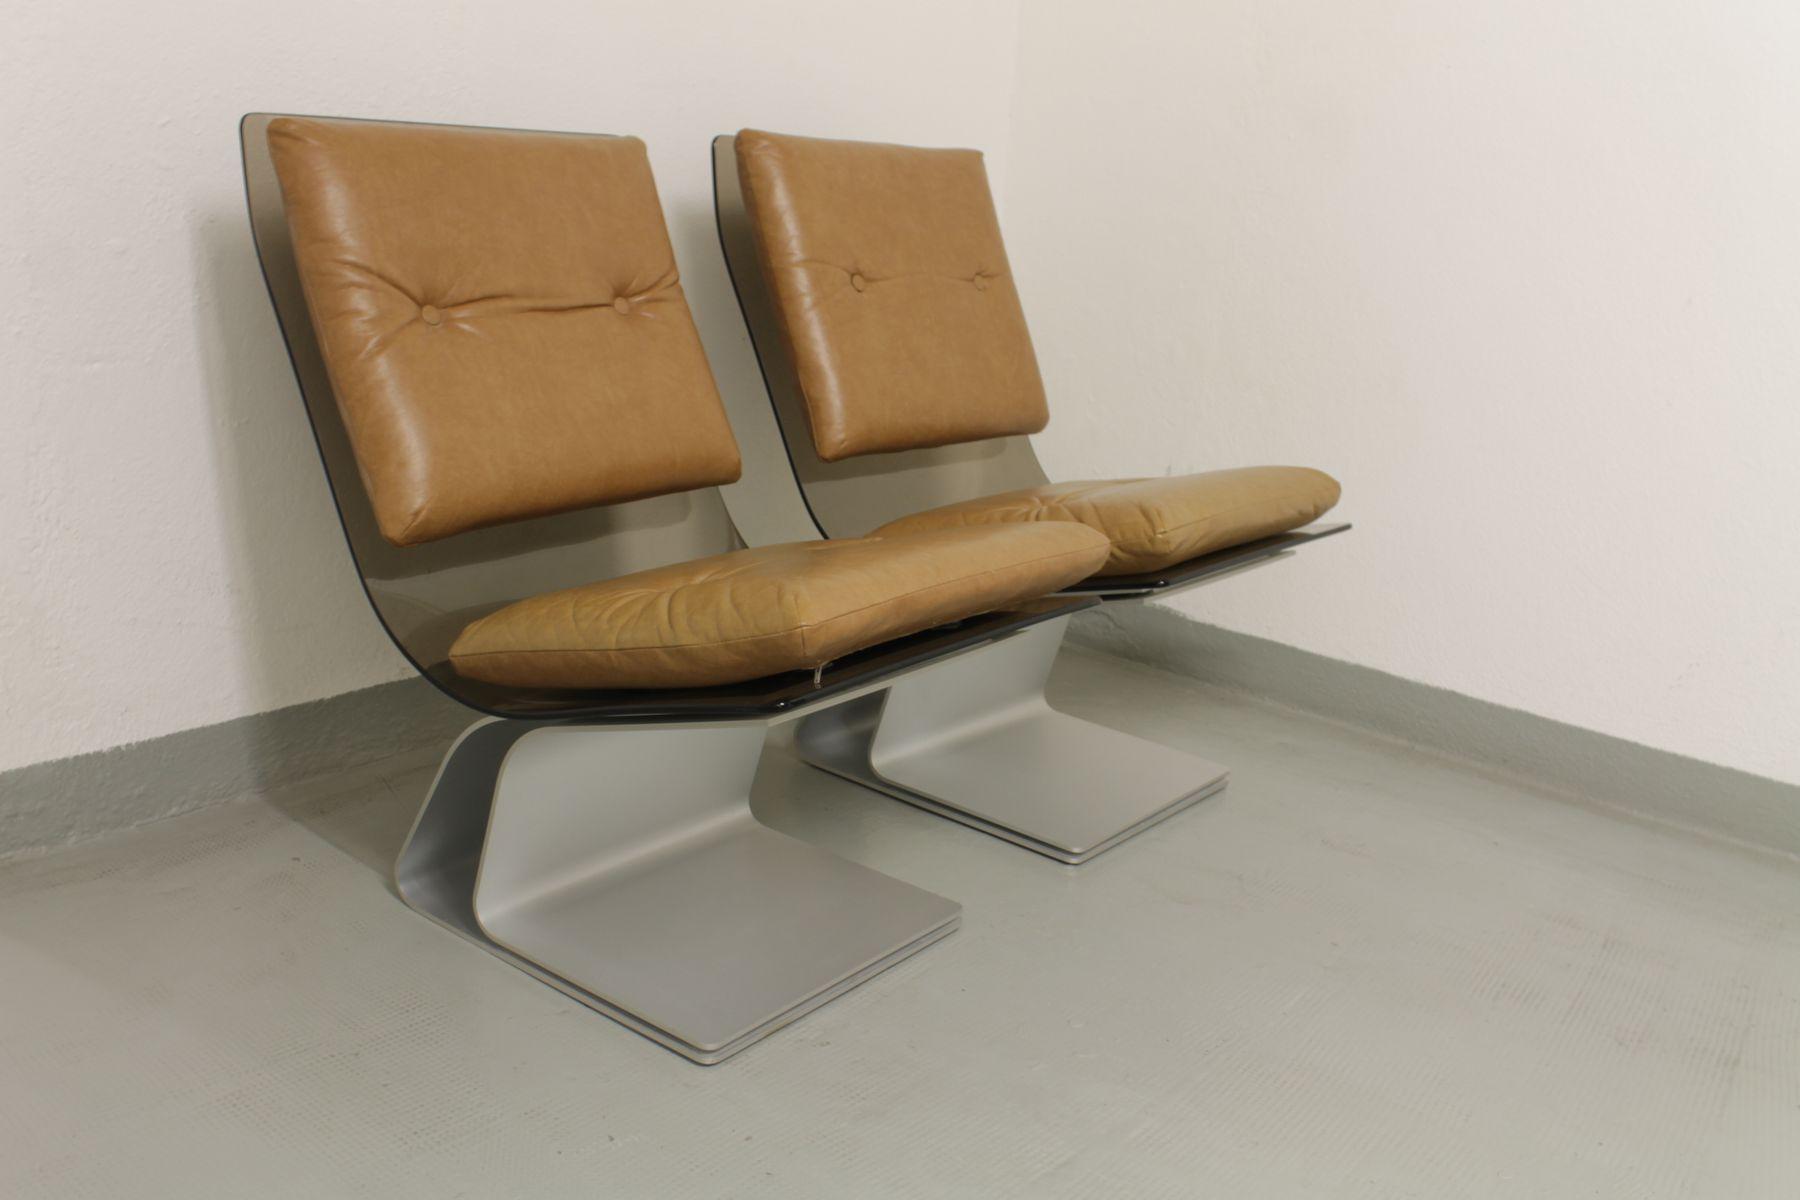 Sessel von Maison Jansen, 1970er, 2er Set